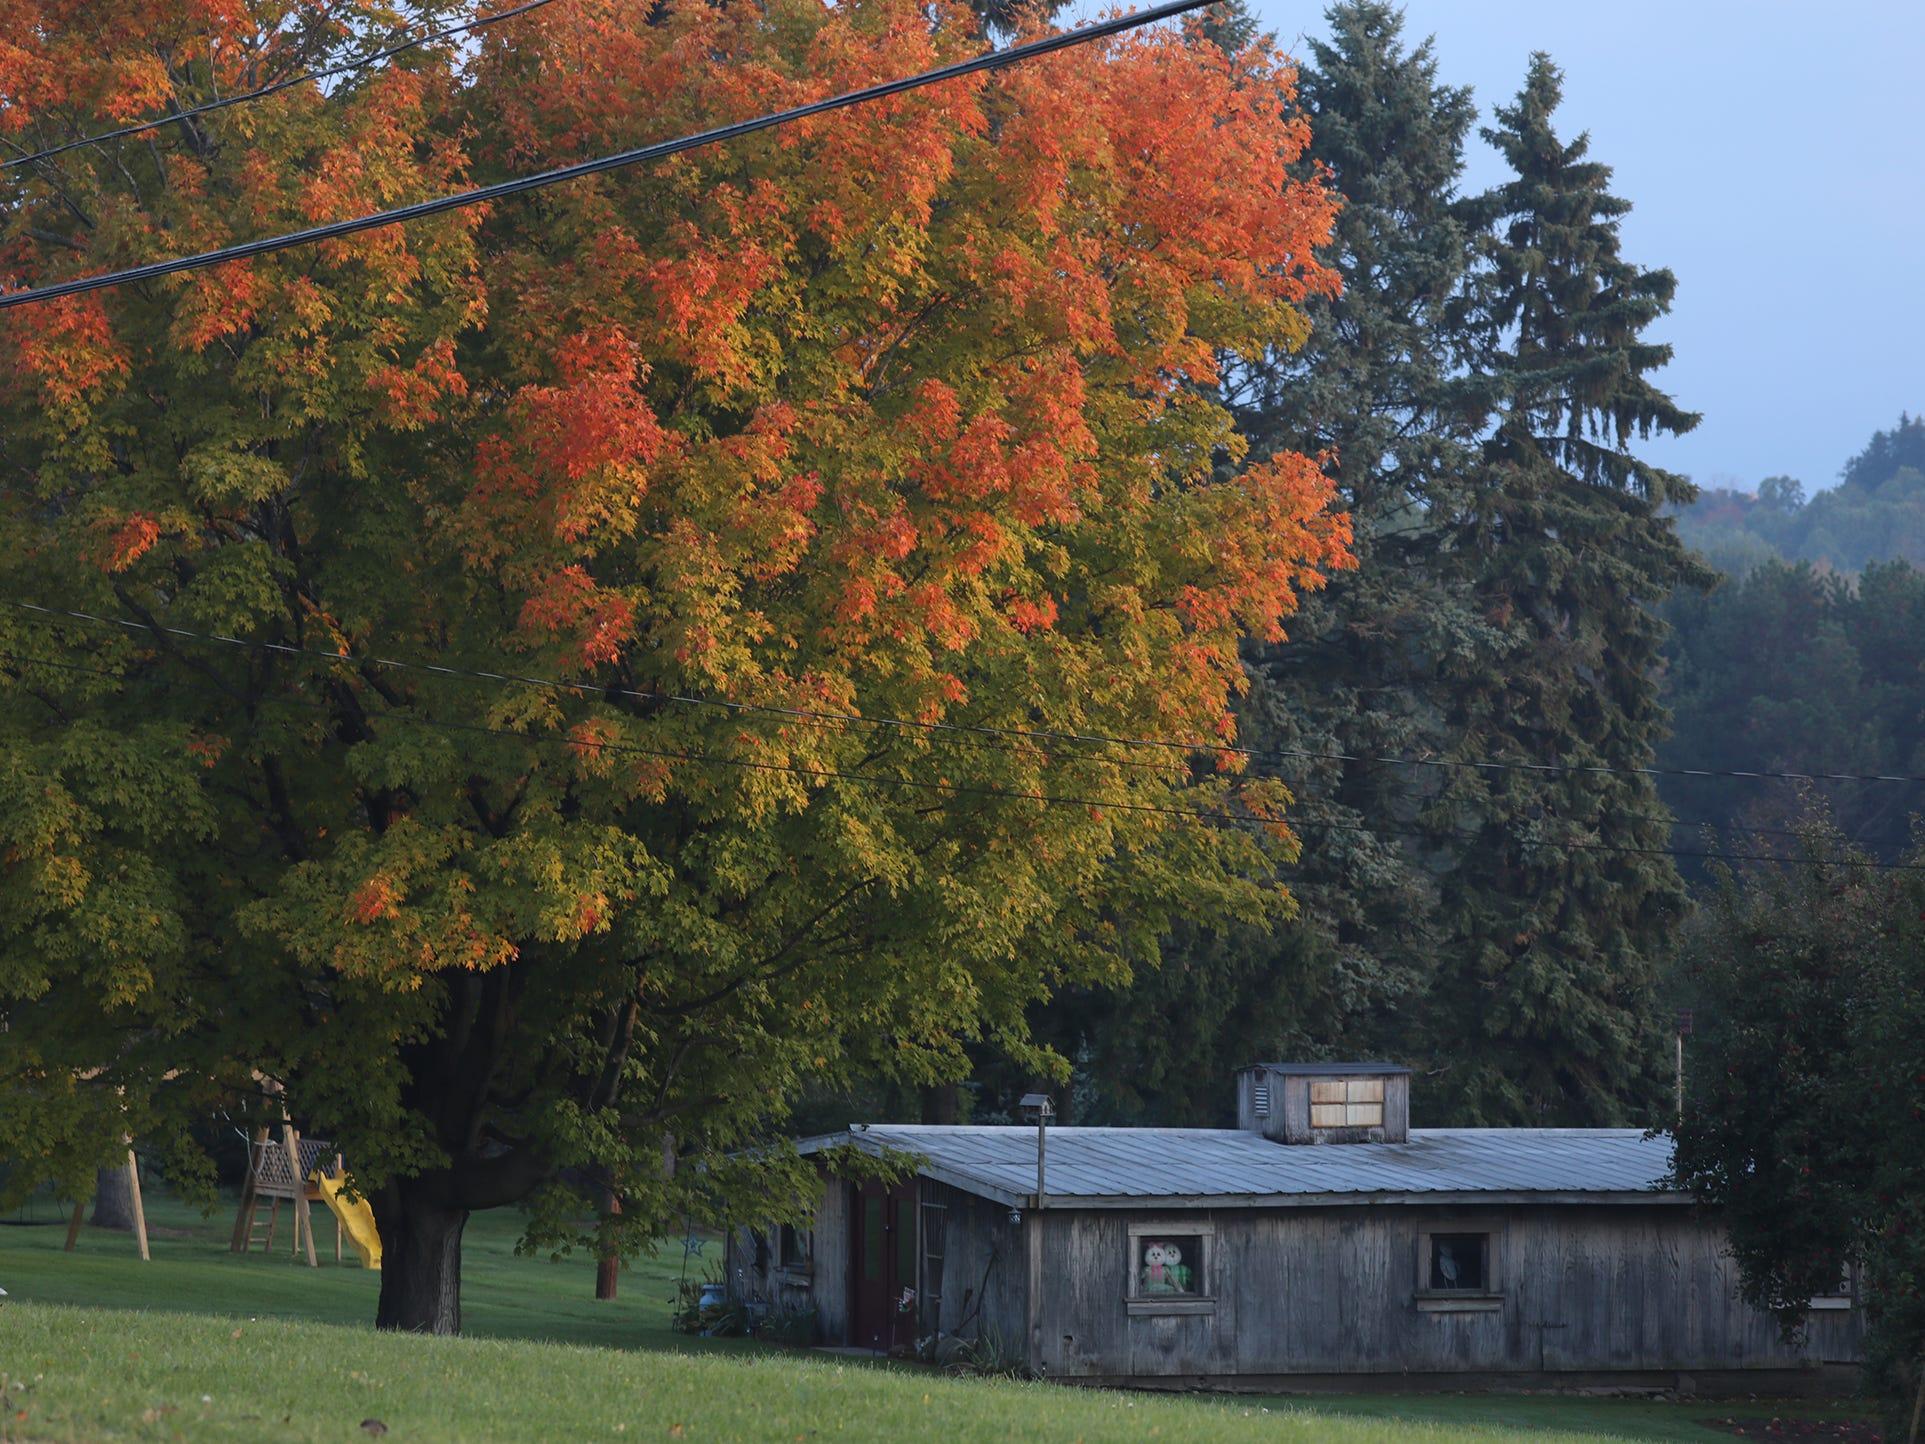 Fall colors in Sodus.